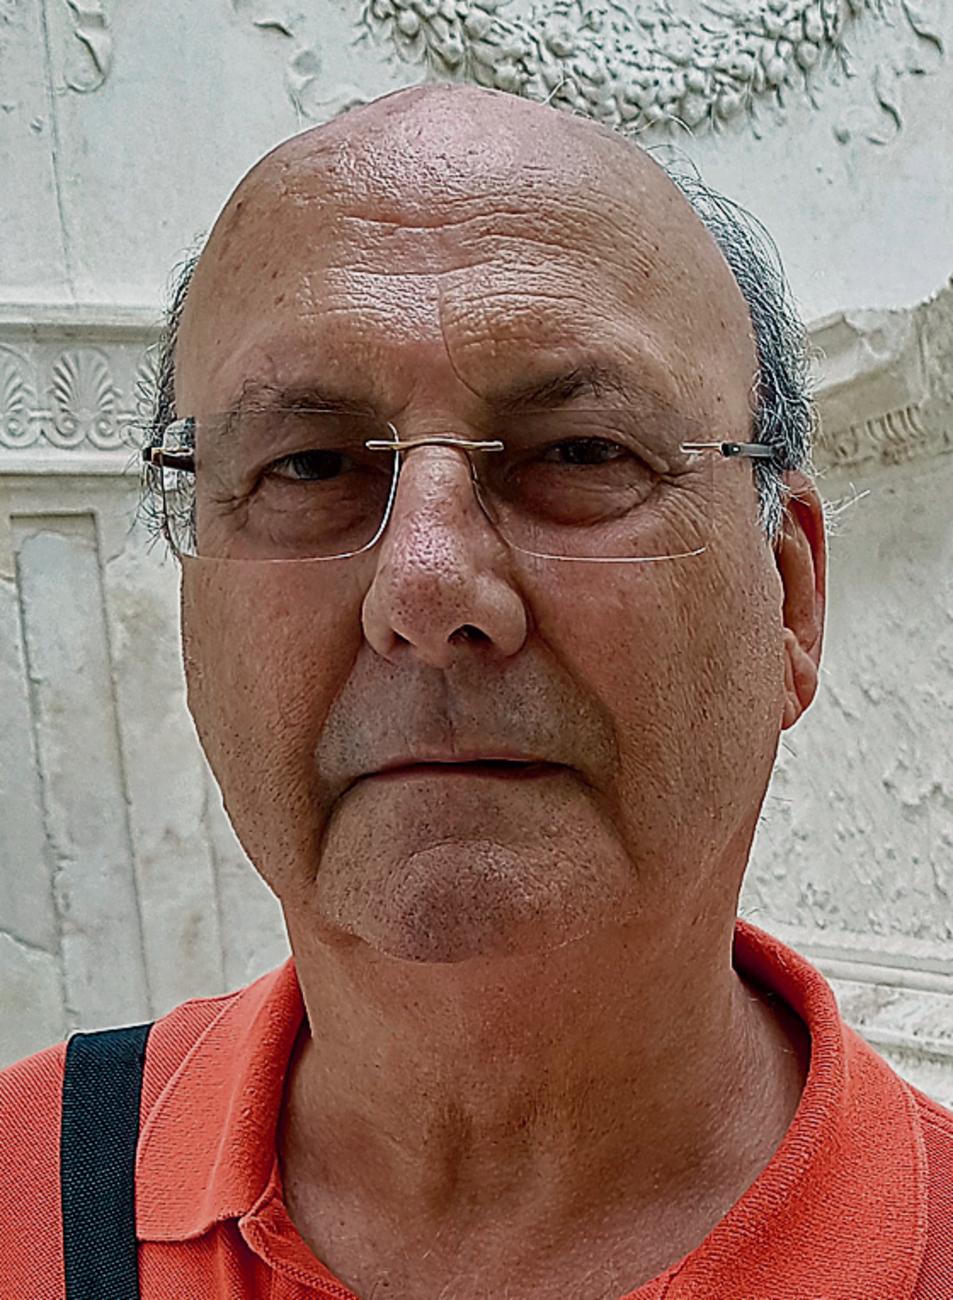 Antoni Pujol Niubó